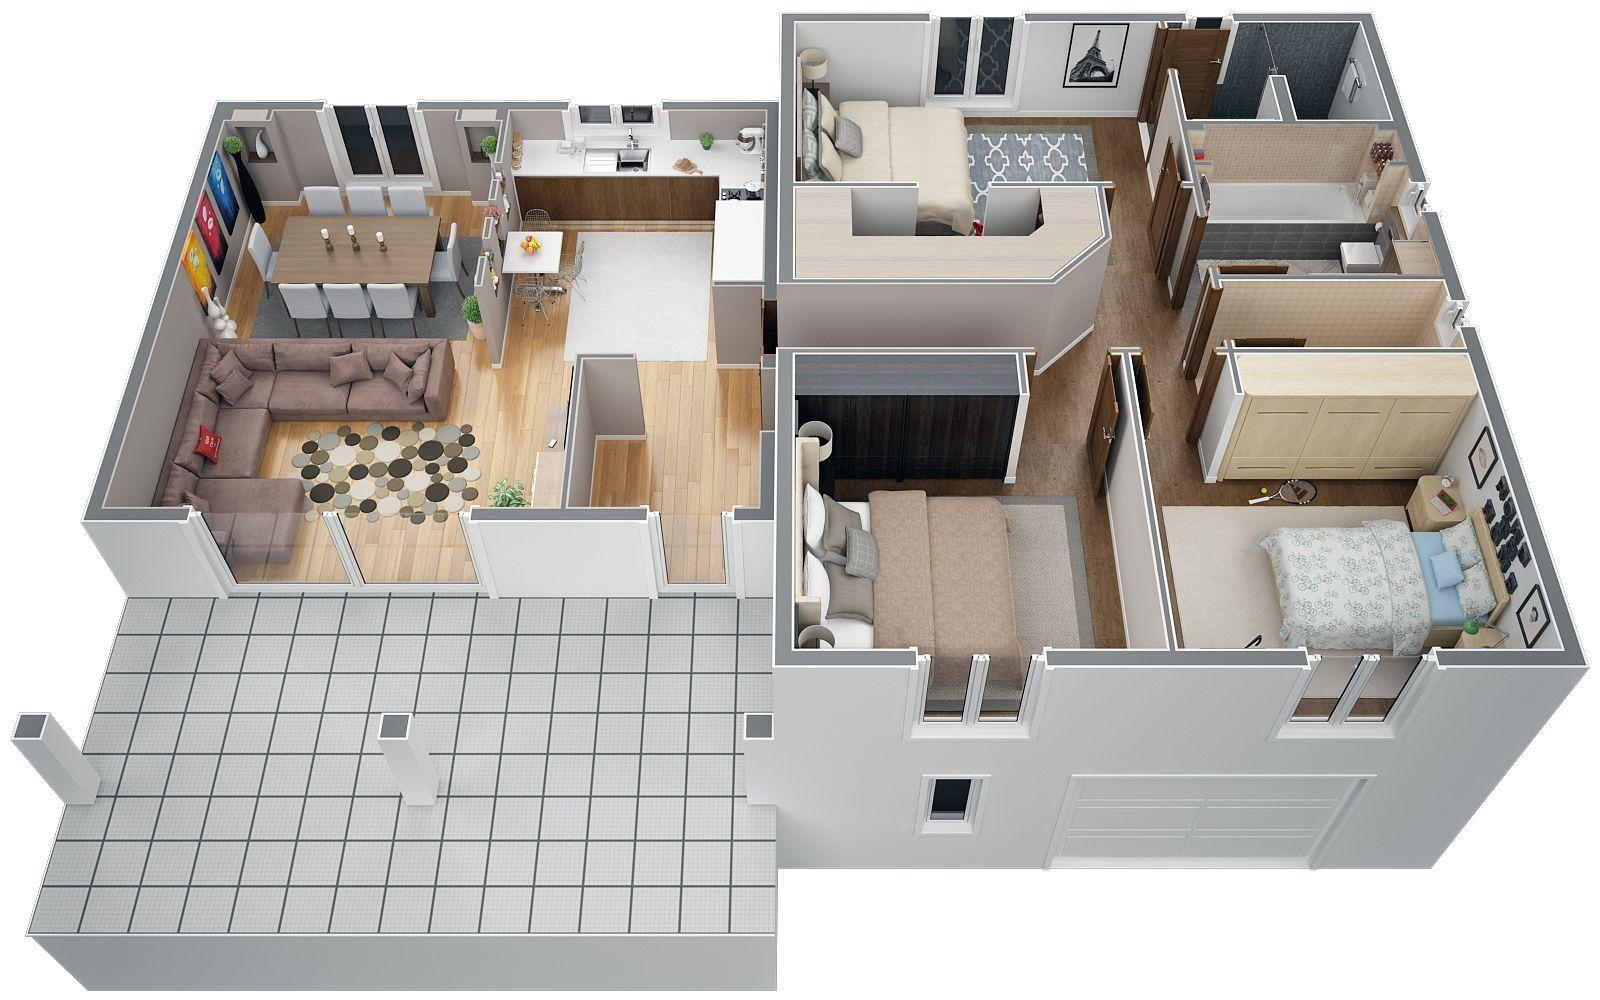 Maison Plan Plan Maison 100m2 A Etage Avec Garage Plan Maison A Etage 100m2 House Plans Apartment Plans Modern House Design